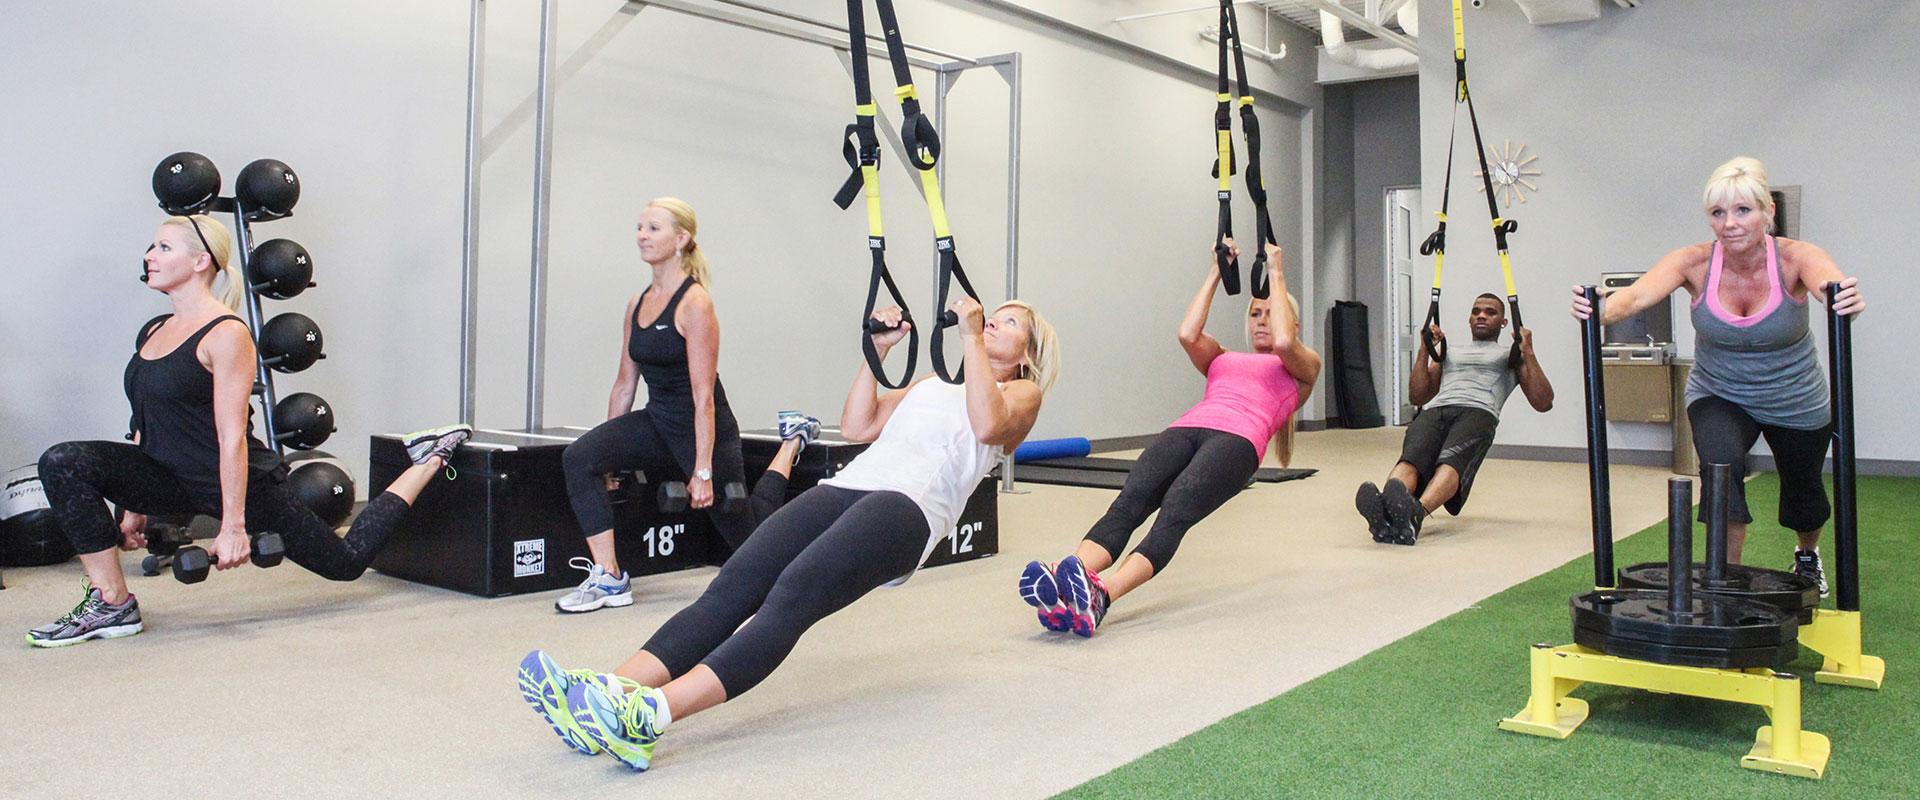 Movati Athletic Brantford - New Functional Training Area